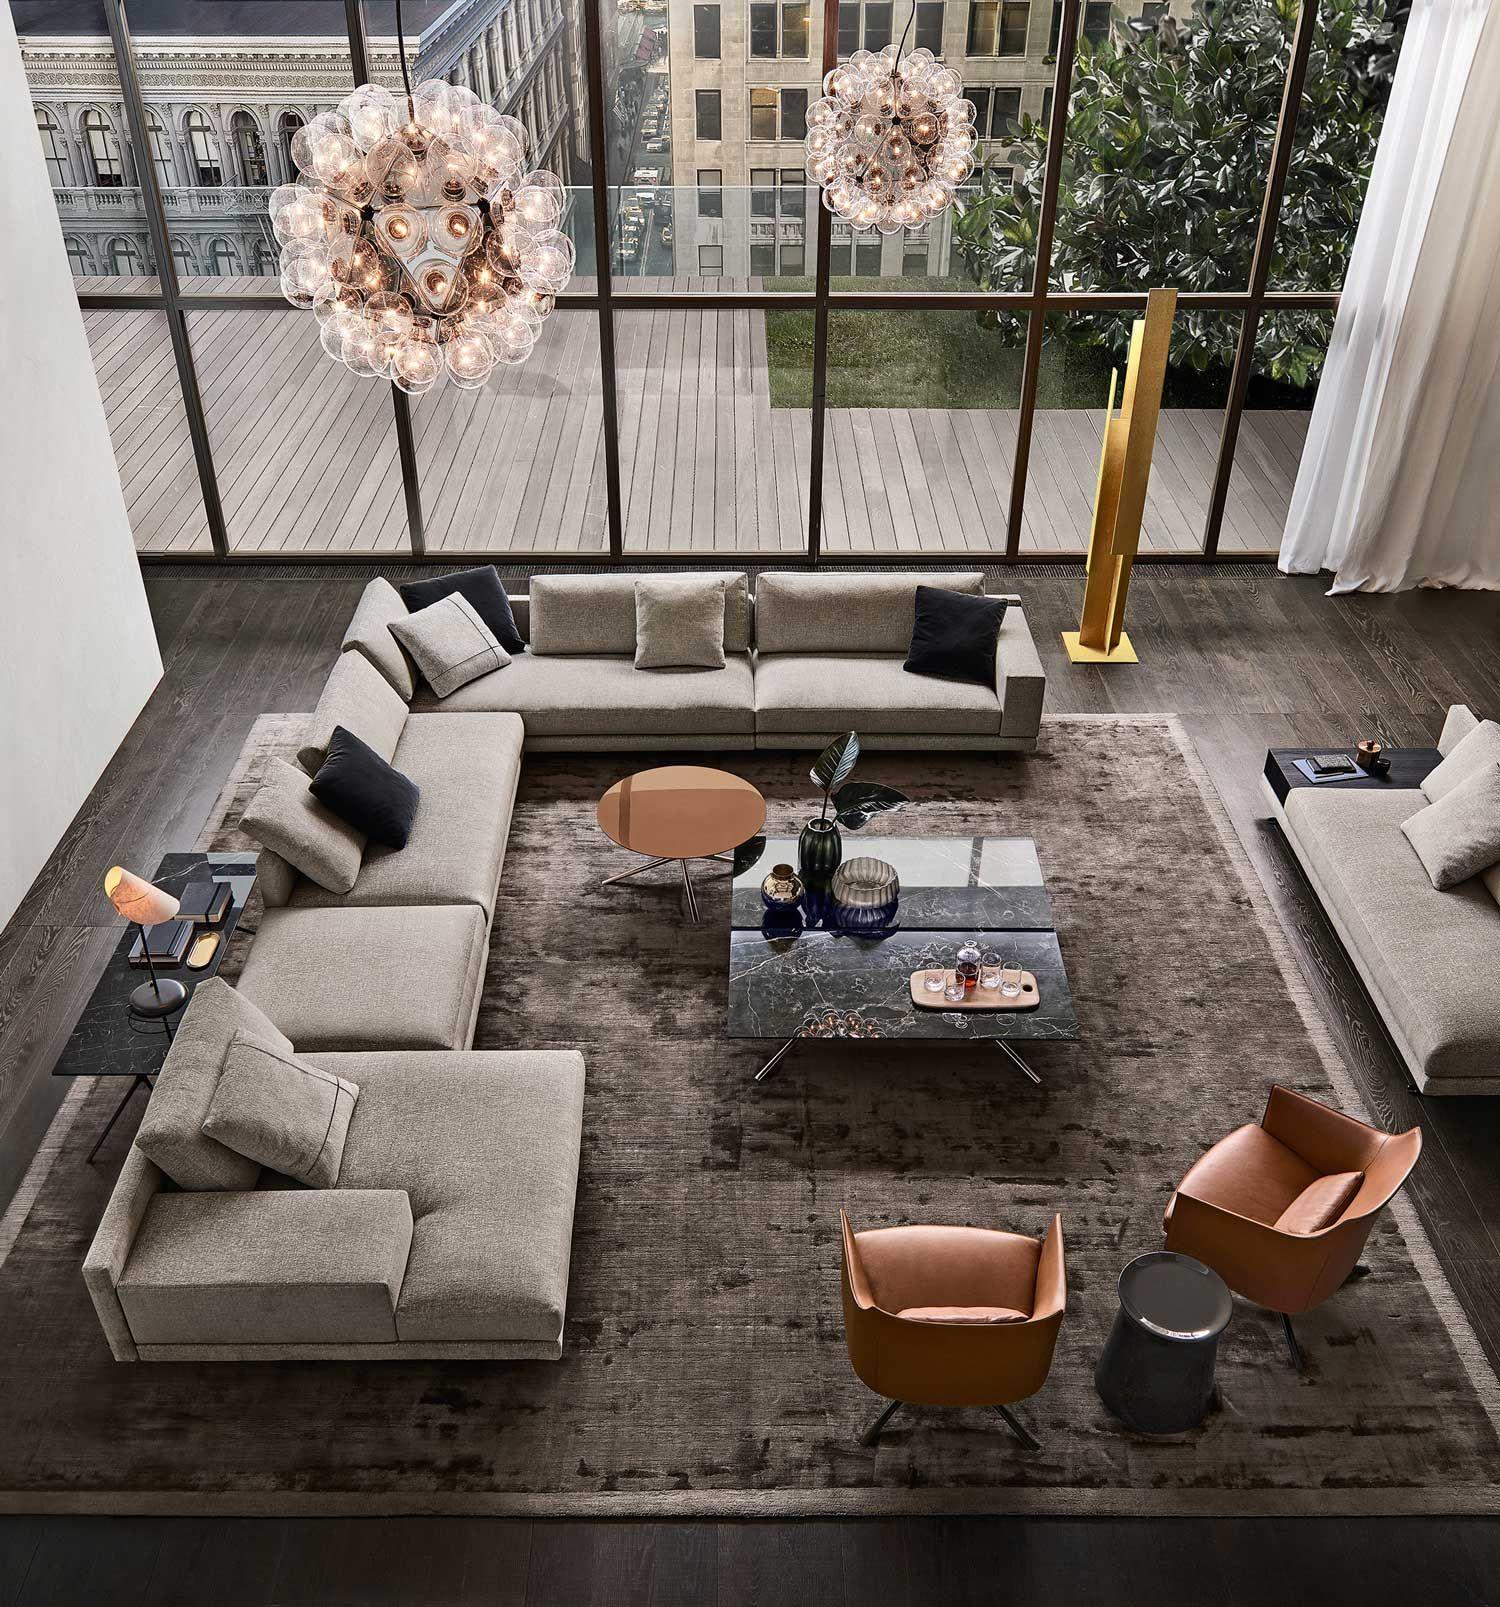 Poliform Mondrian Sofa by Jean-Marie Massaud | Mondrian, Living ...